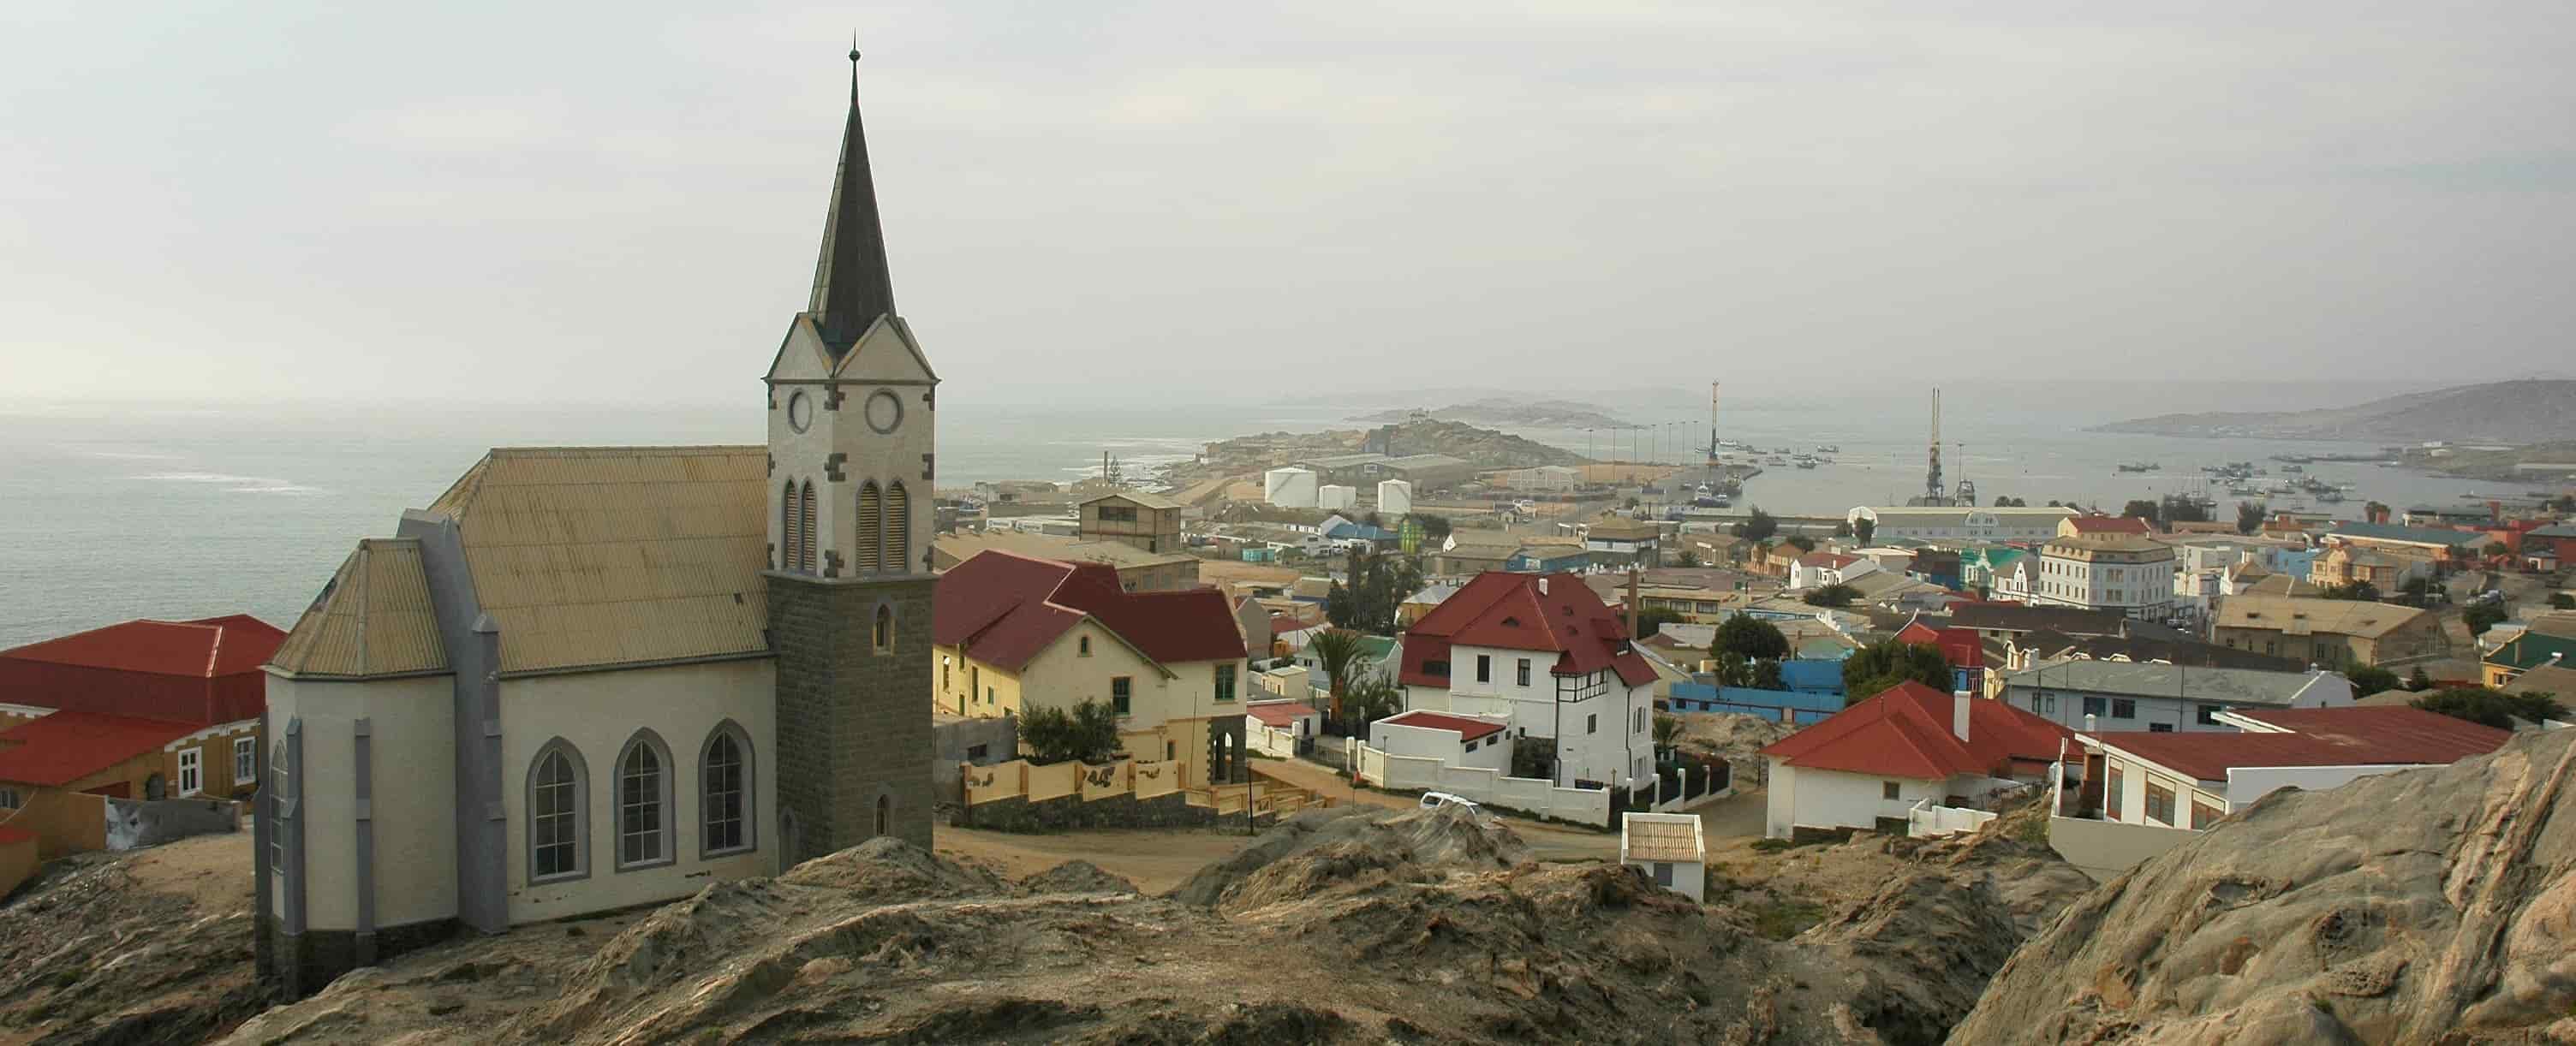 Everlasting Church on a Rock